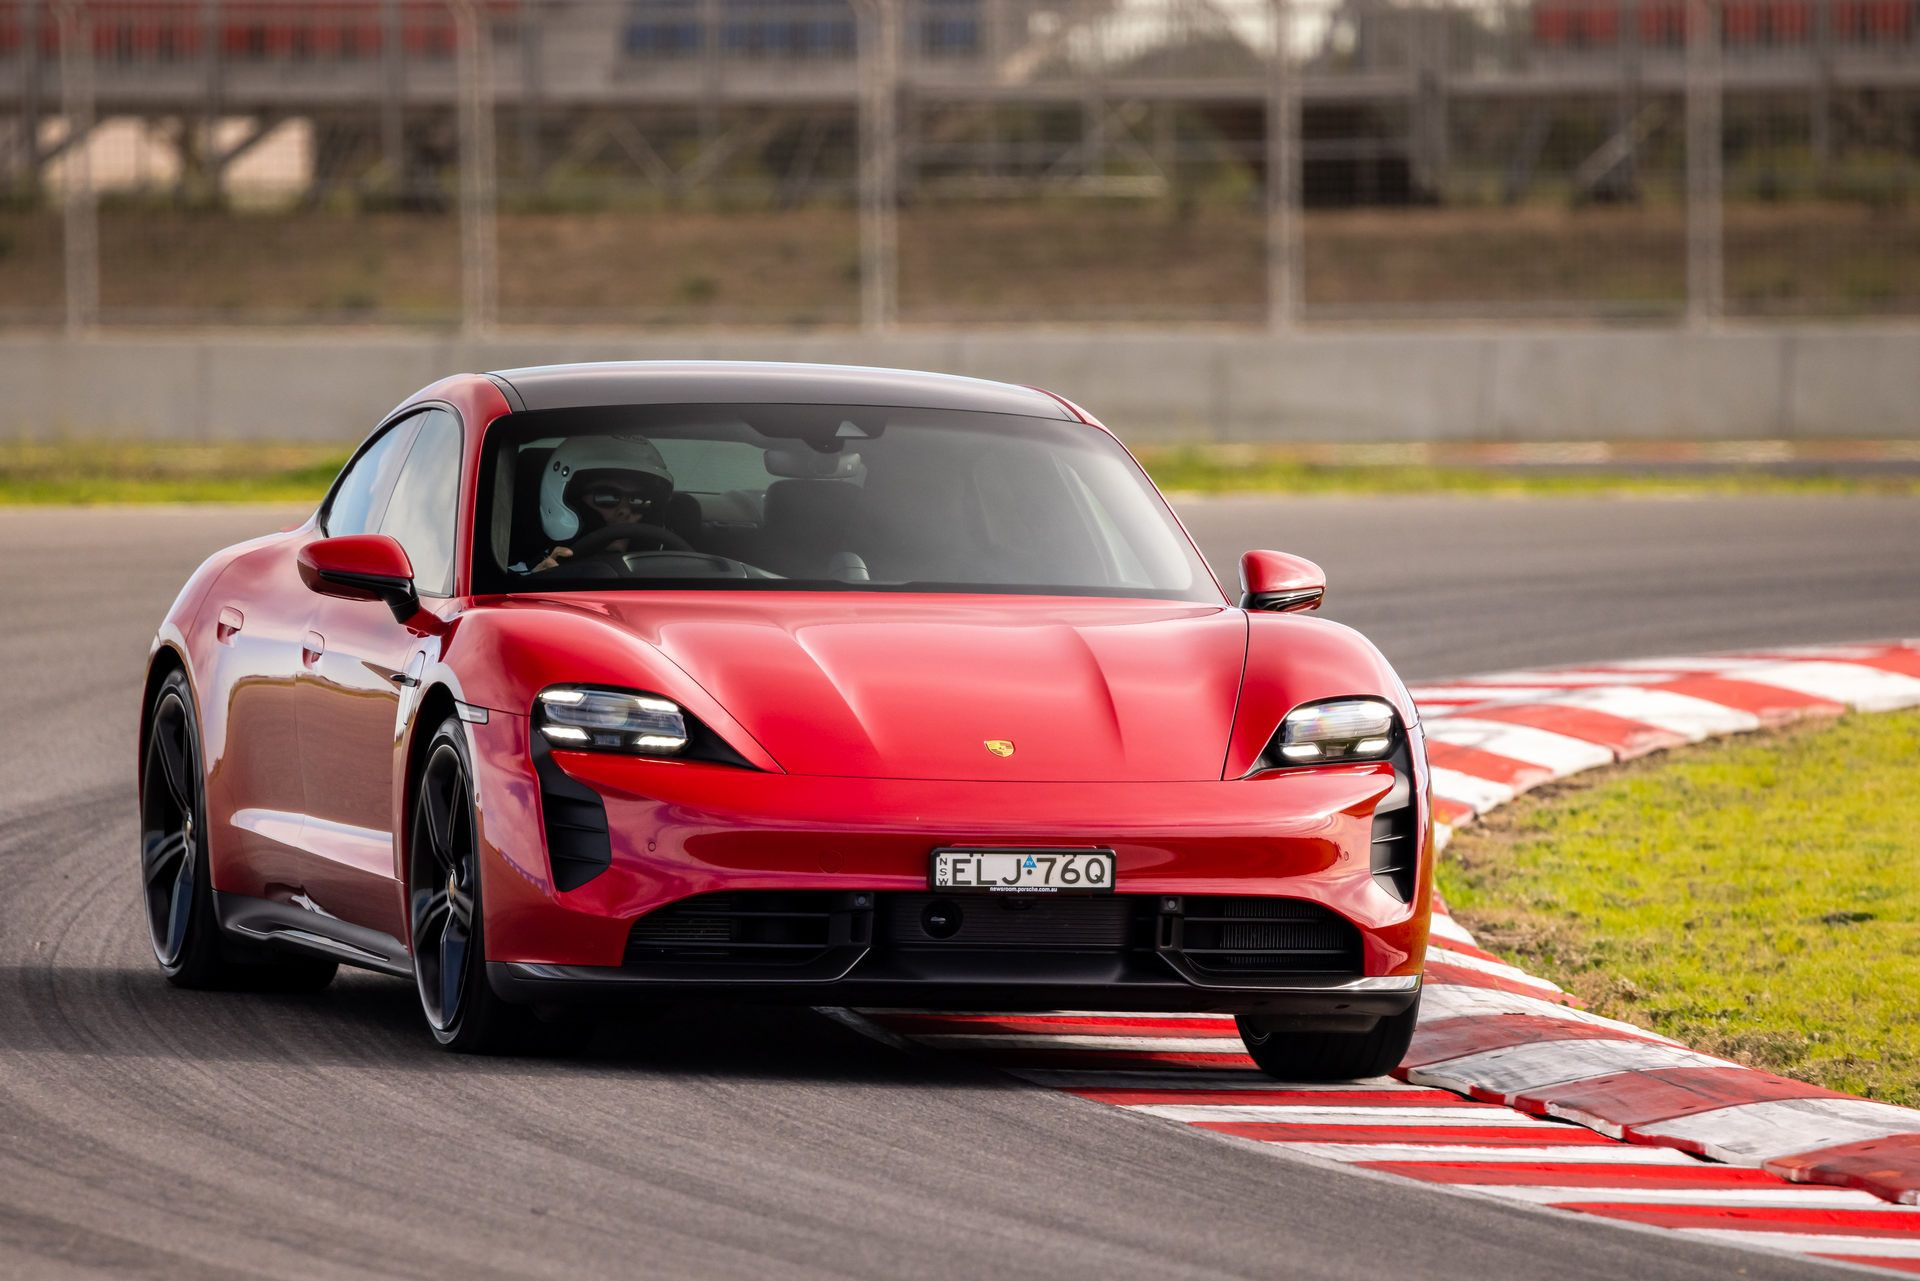 Porsche-Taycan-Turbo-S-The-Bend-Motorsport-Park-9